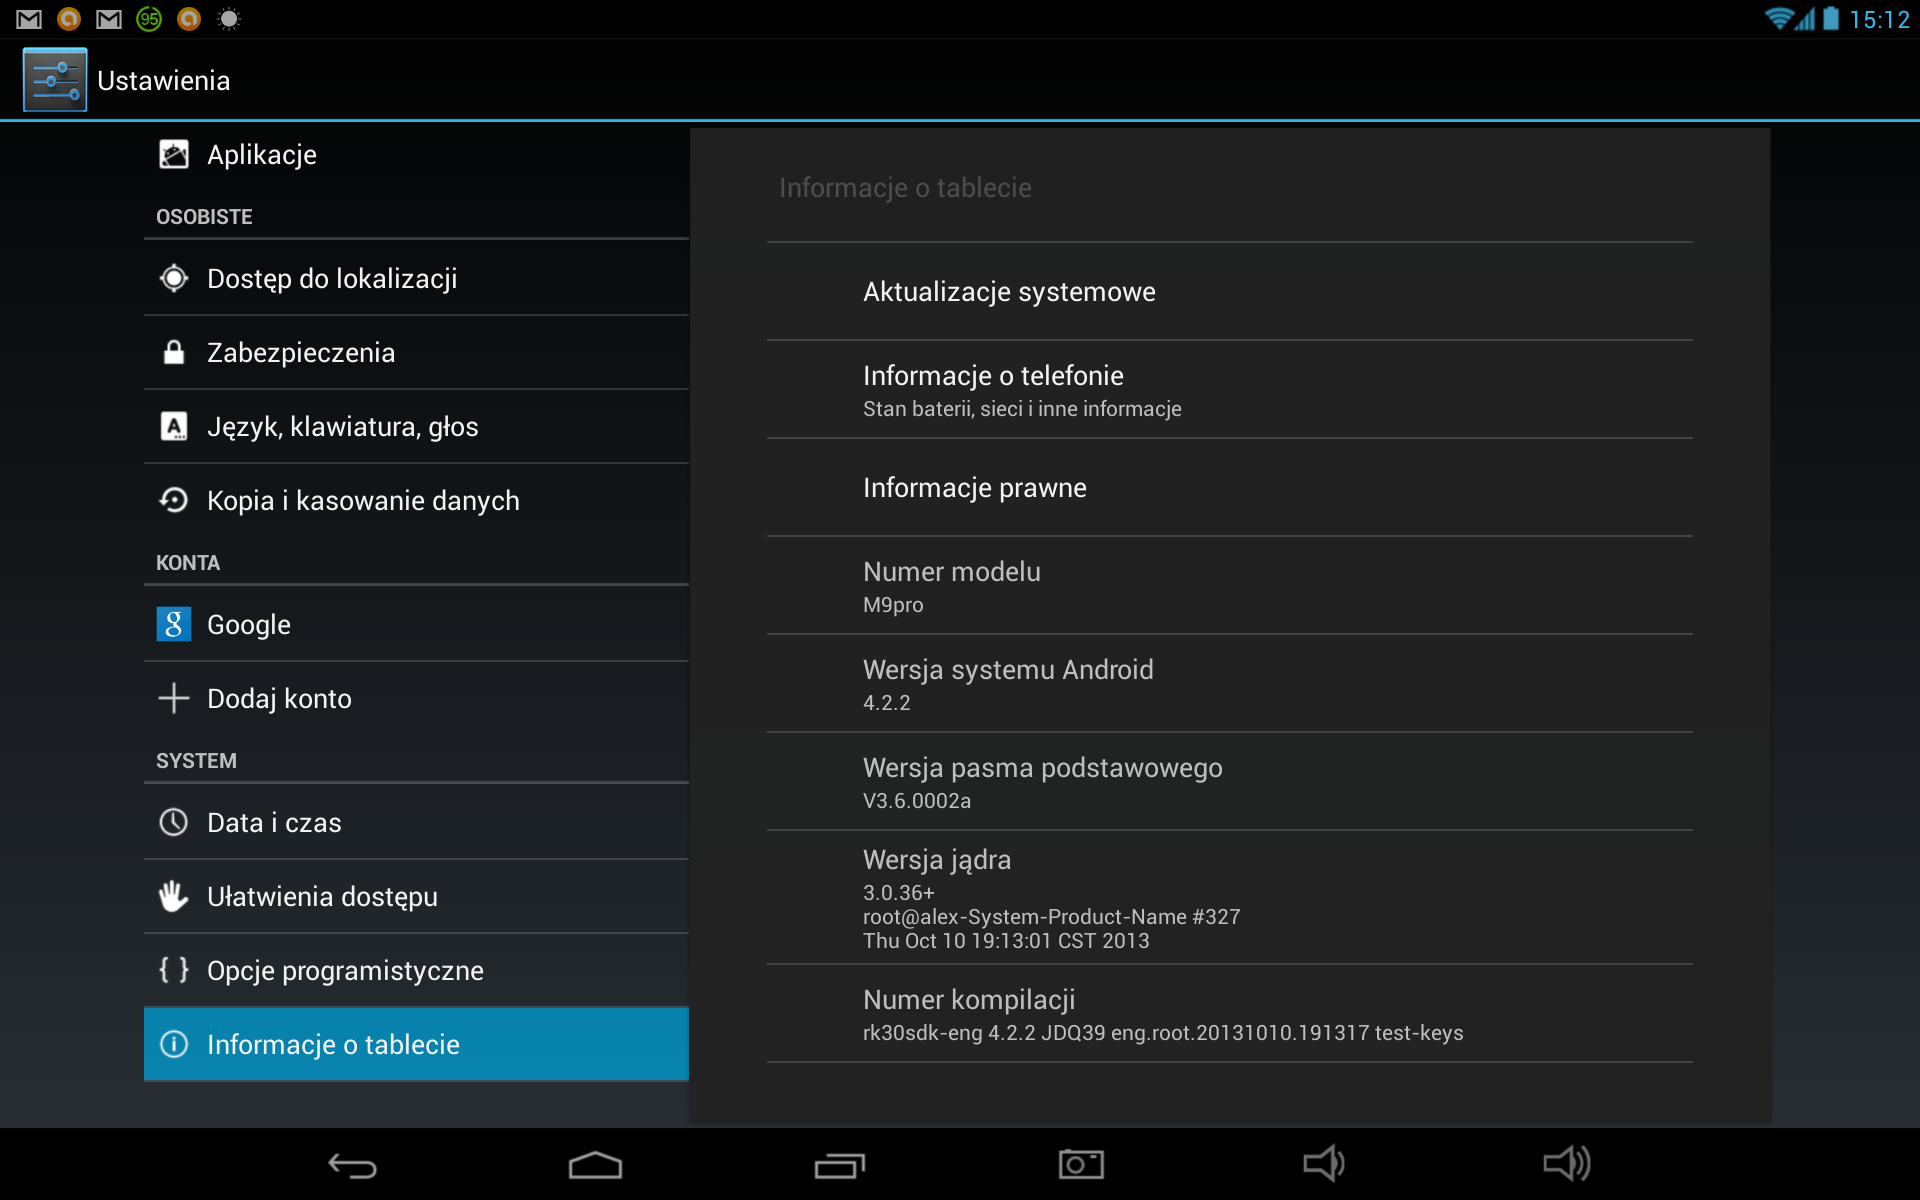 Screenshot_2013-10-19-15-12-27.png